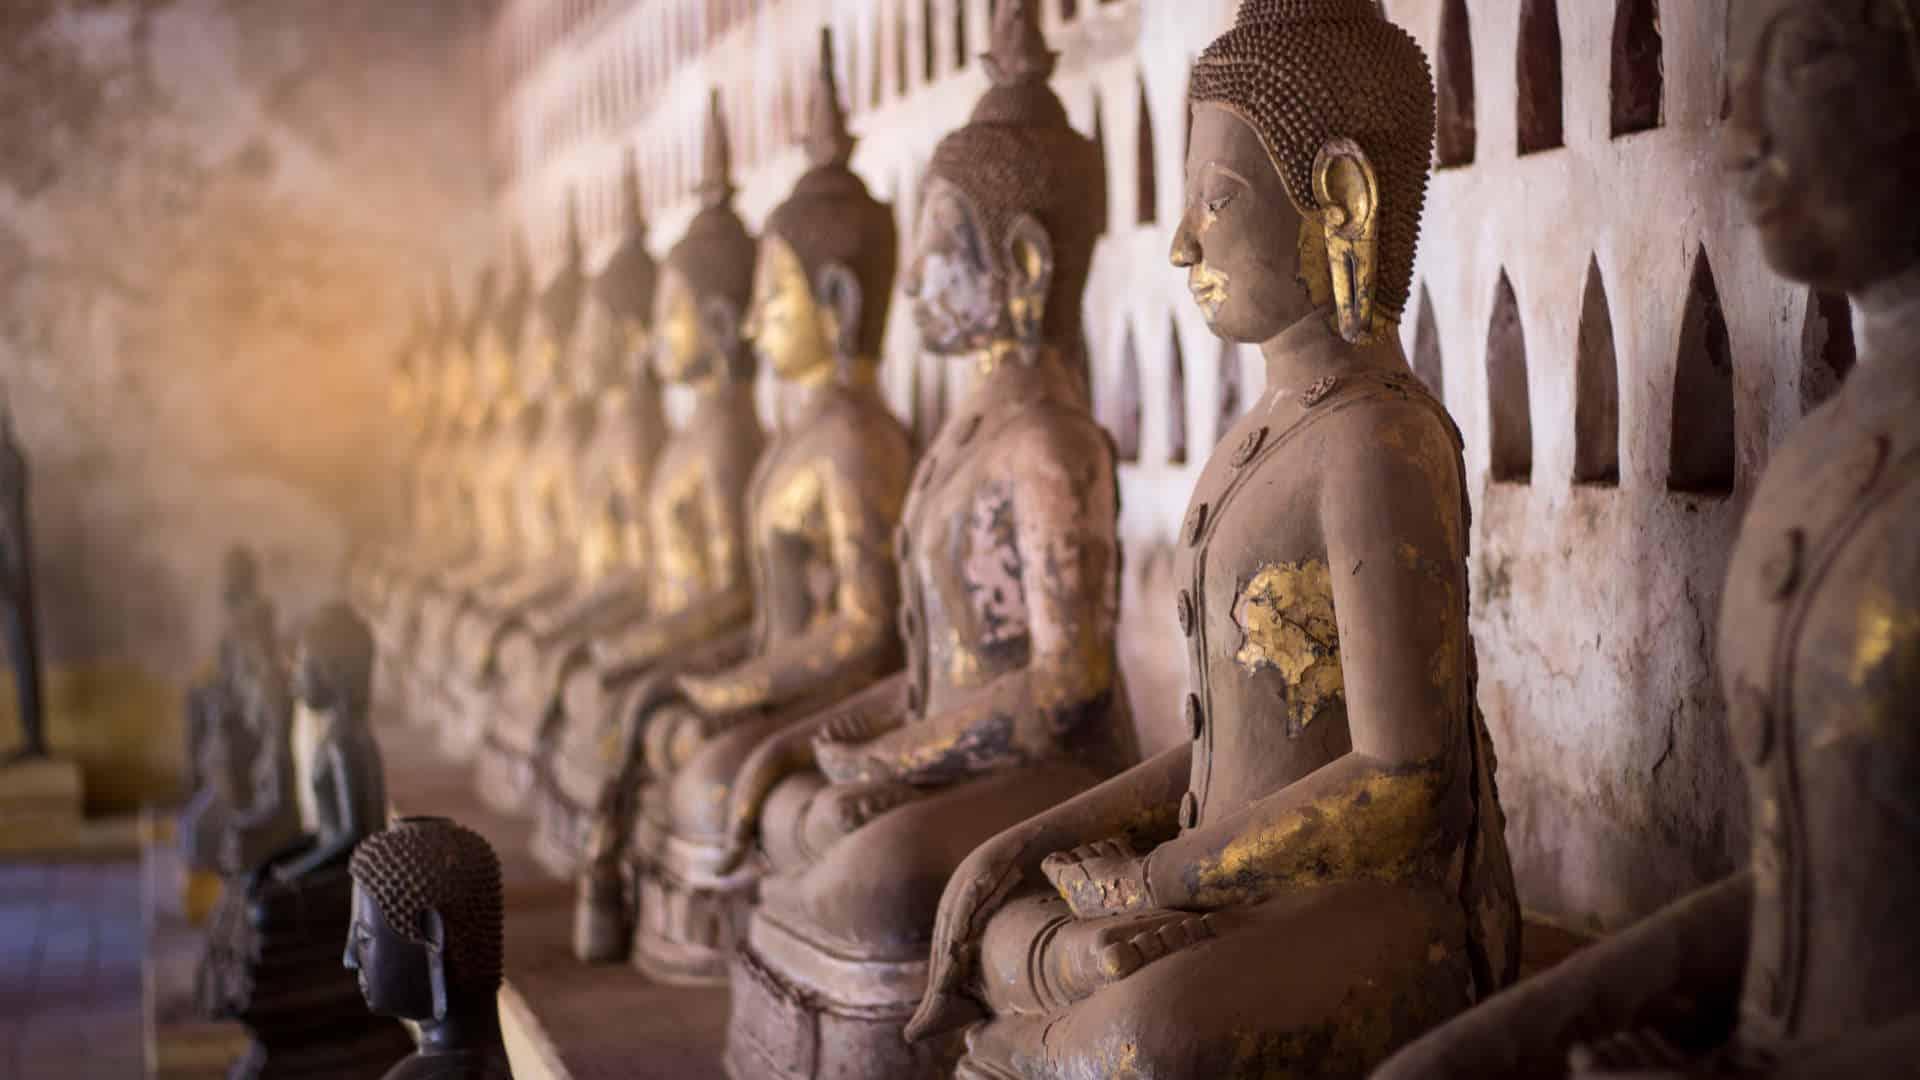 Laos temple statues